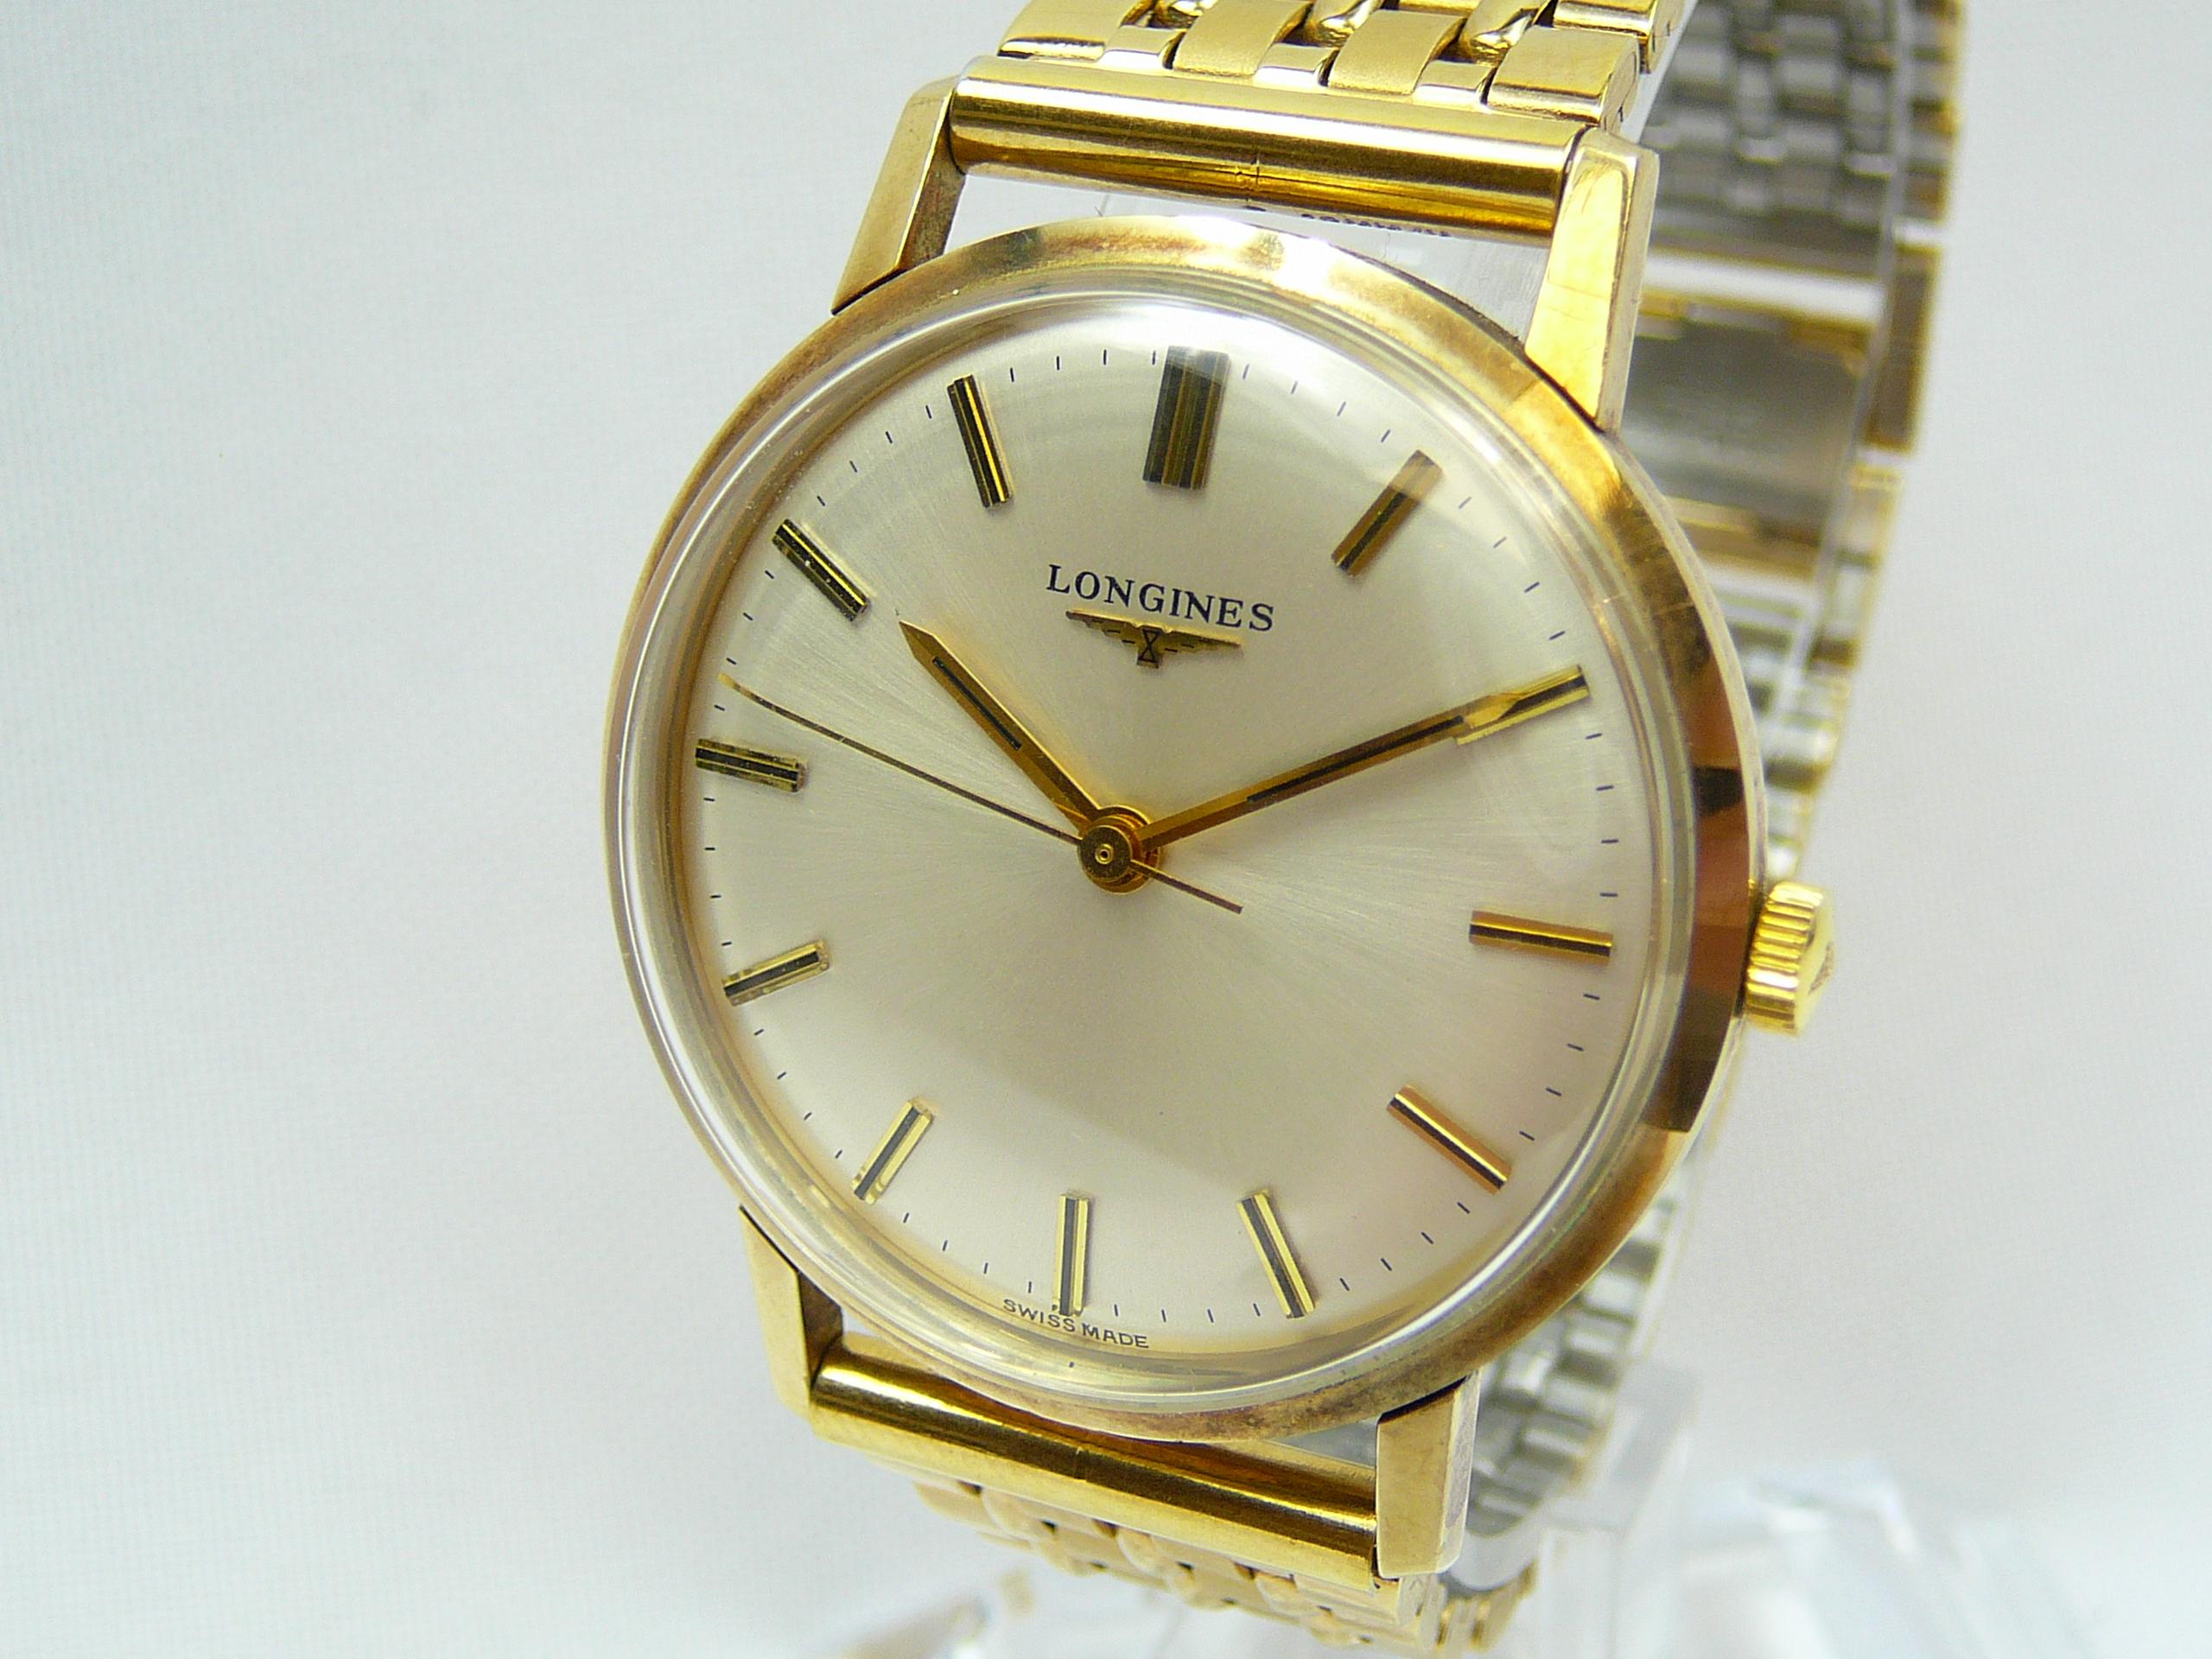 Gents Vintage Gold Longines Wrist Watch - Image 2 of 5